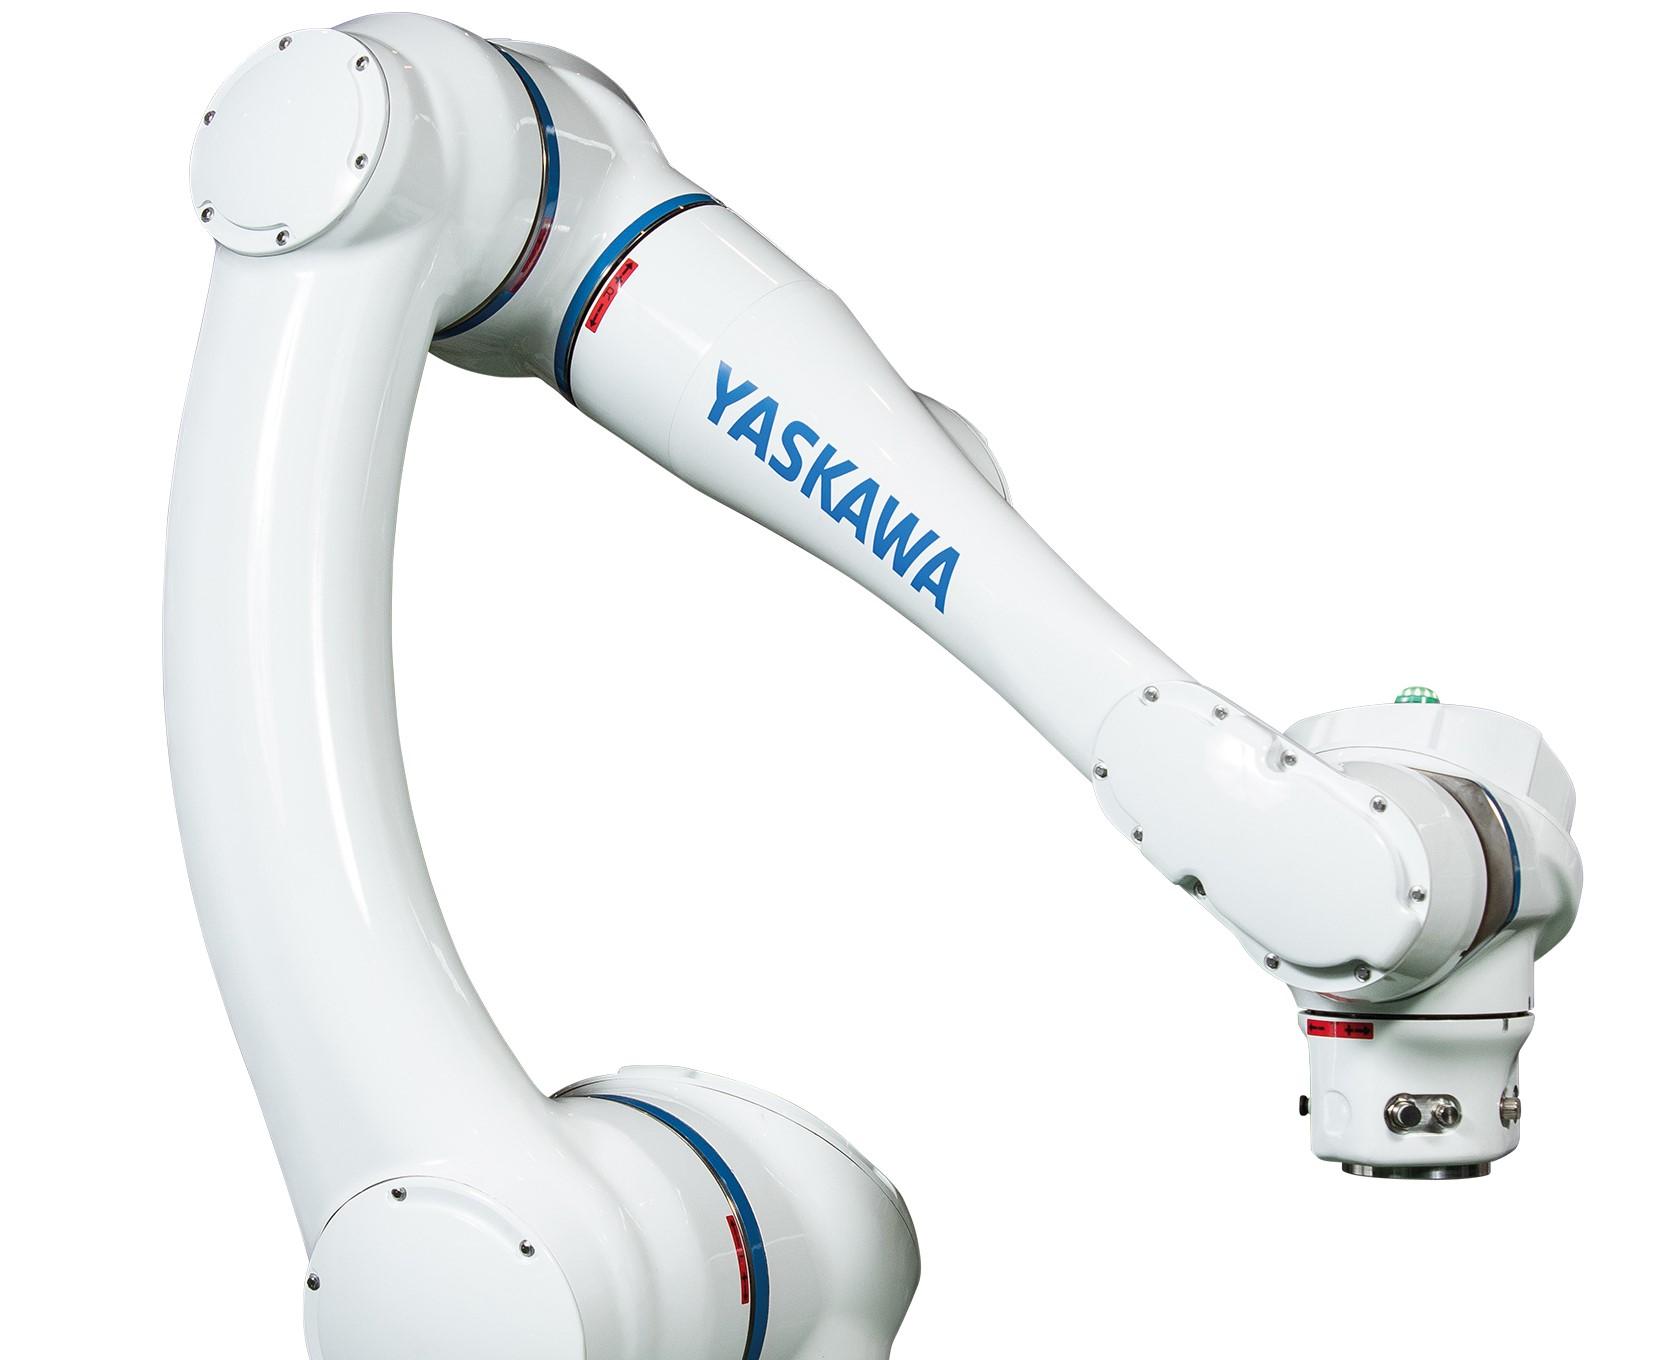 Yaskawa élargit sa gamme de robots collaboratifs